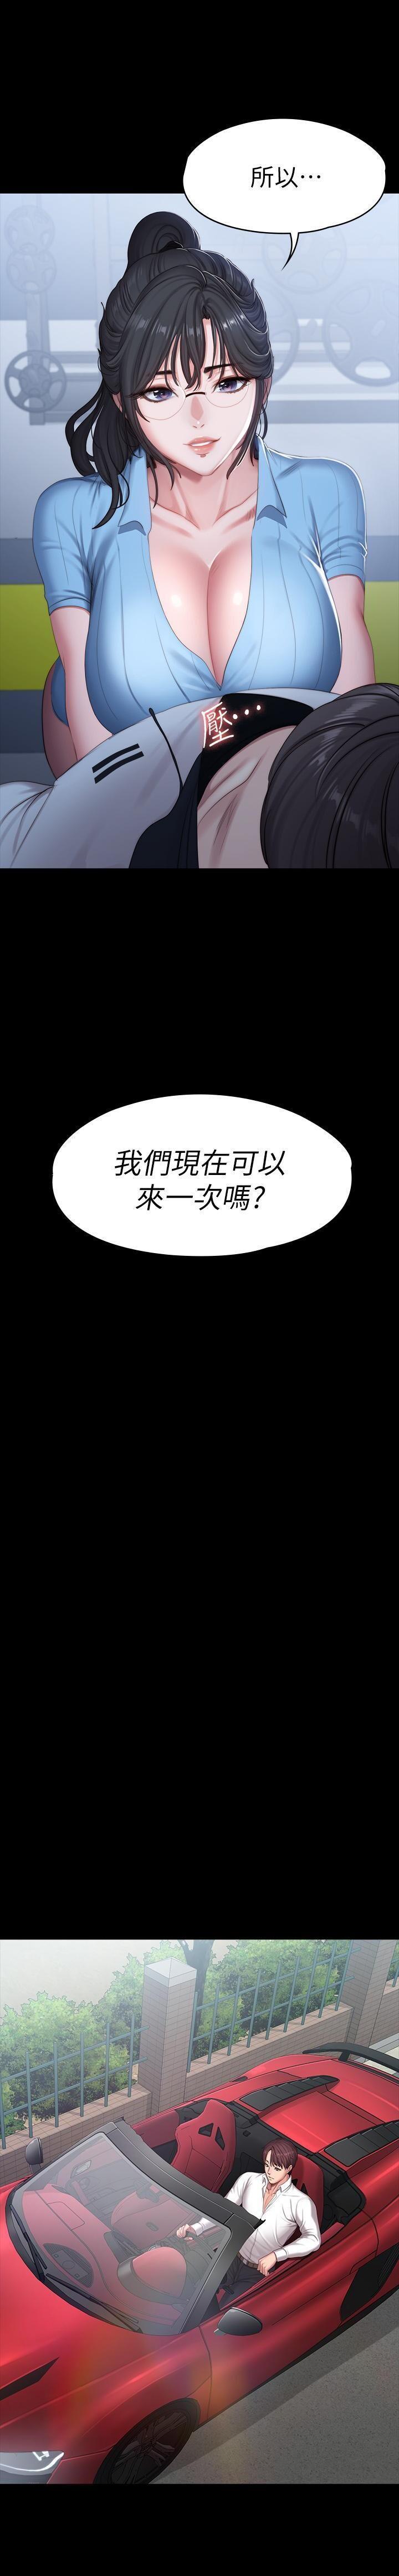 FITNESS 61-88 CHI 610